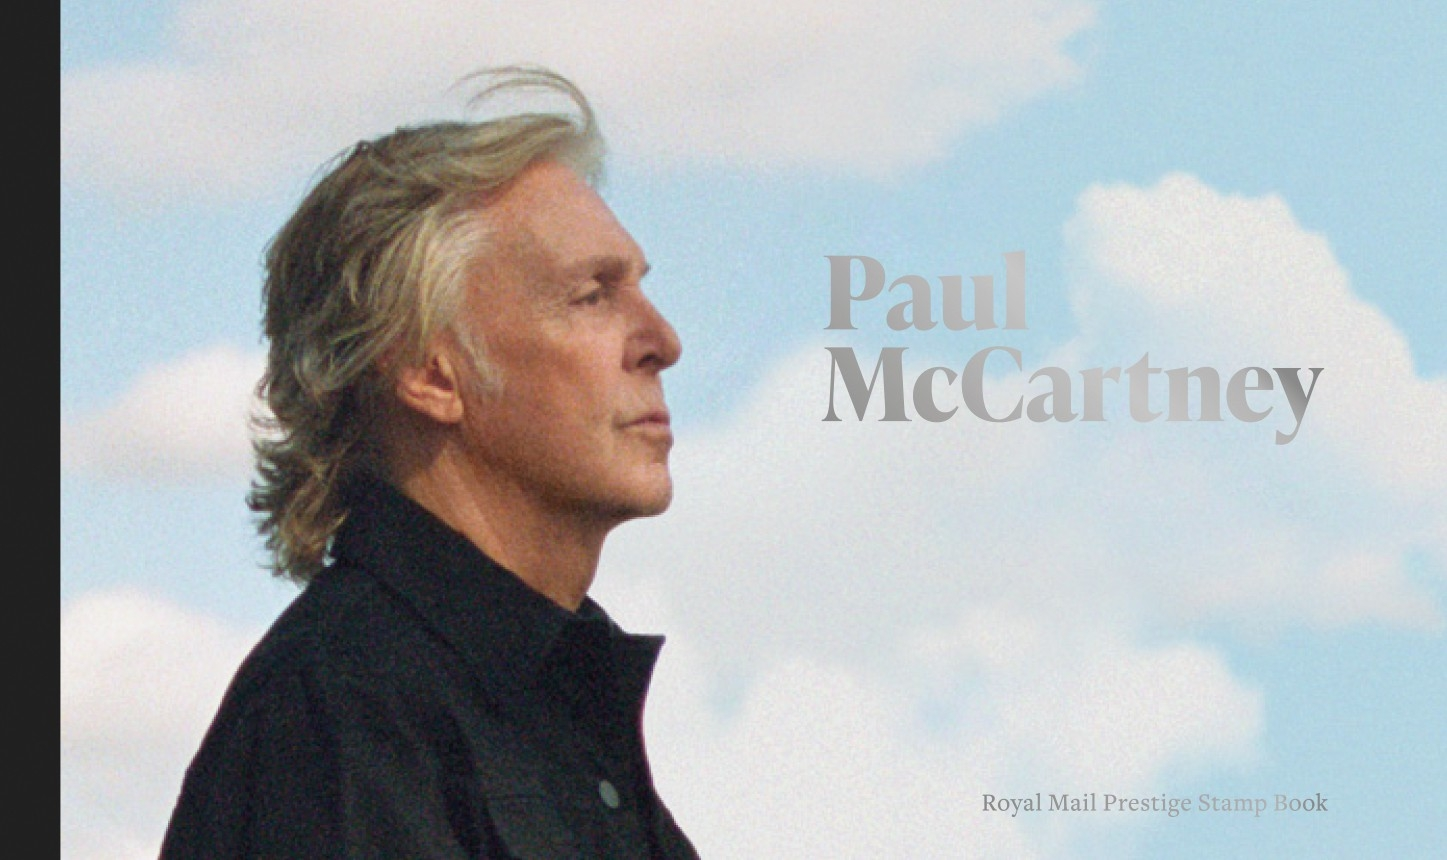 2021 Paul McCartney Limited Edition Prestige Stamp Booklet